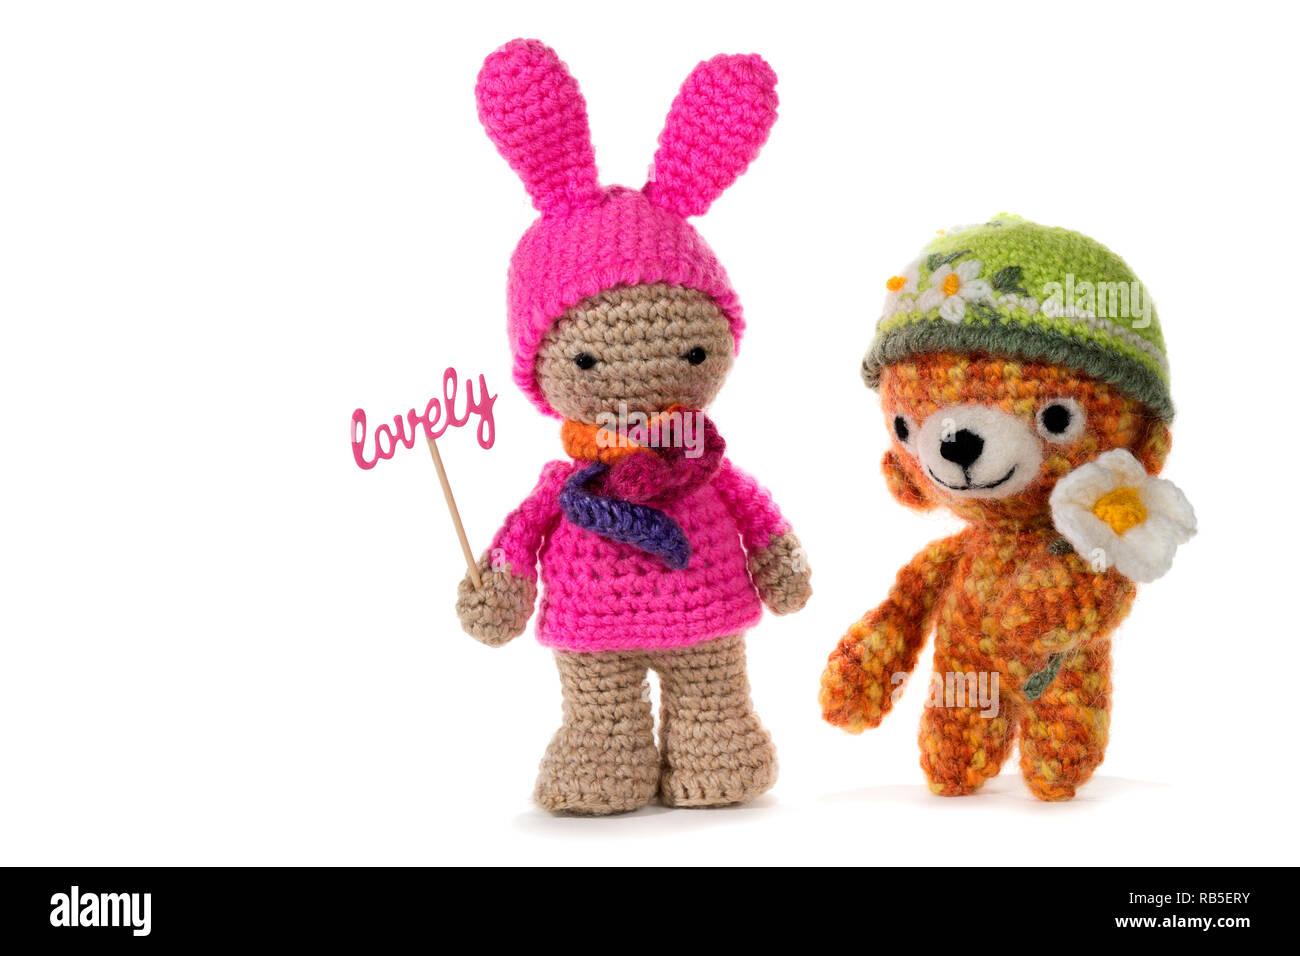 Sweet Crochet Amigurumi Ideas   Crochet patterns, Amigurumi doll ...   956x1300